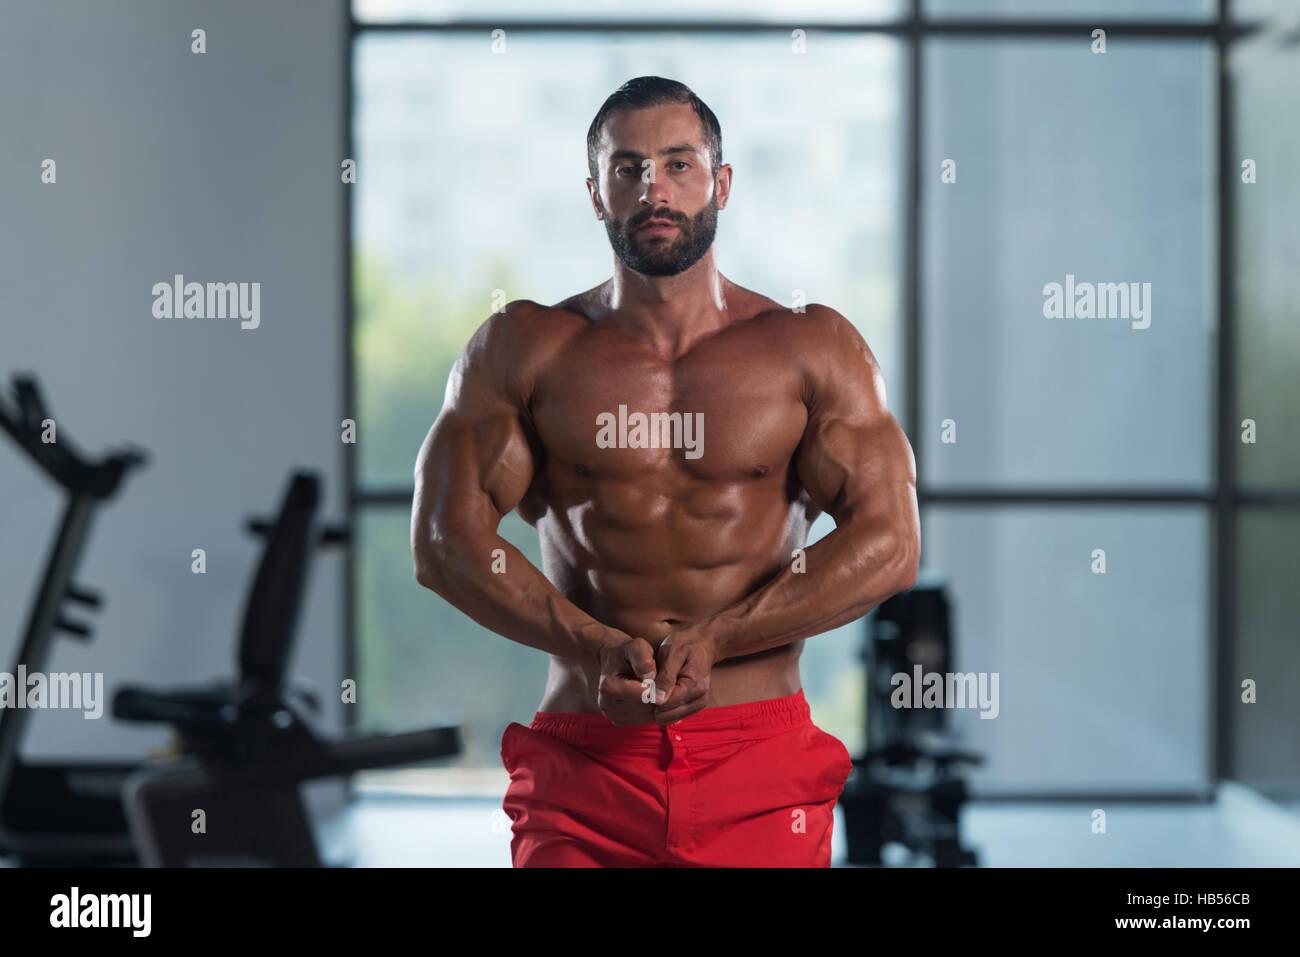 Man Showing Abdominal Muscle — Stock Photo © ibrak #155051334